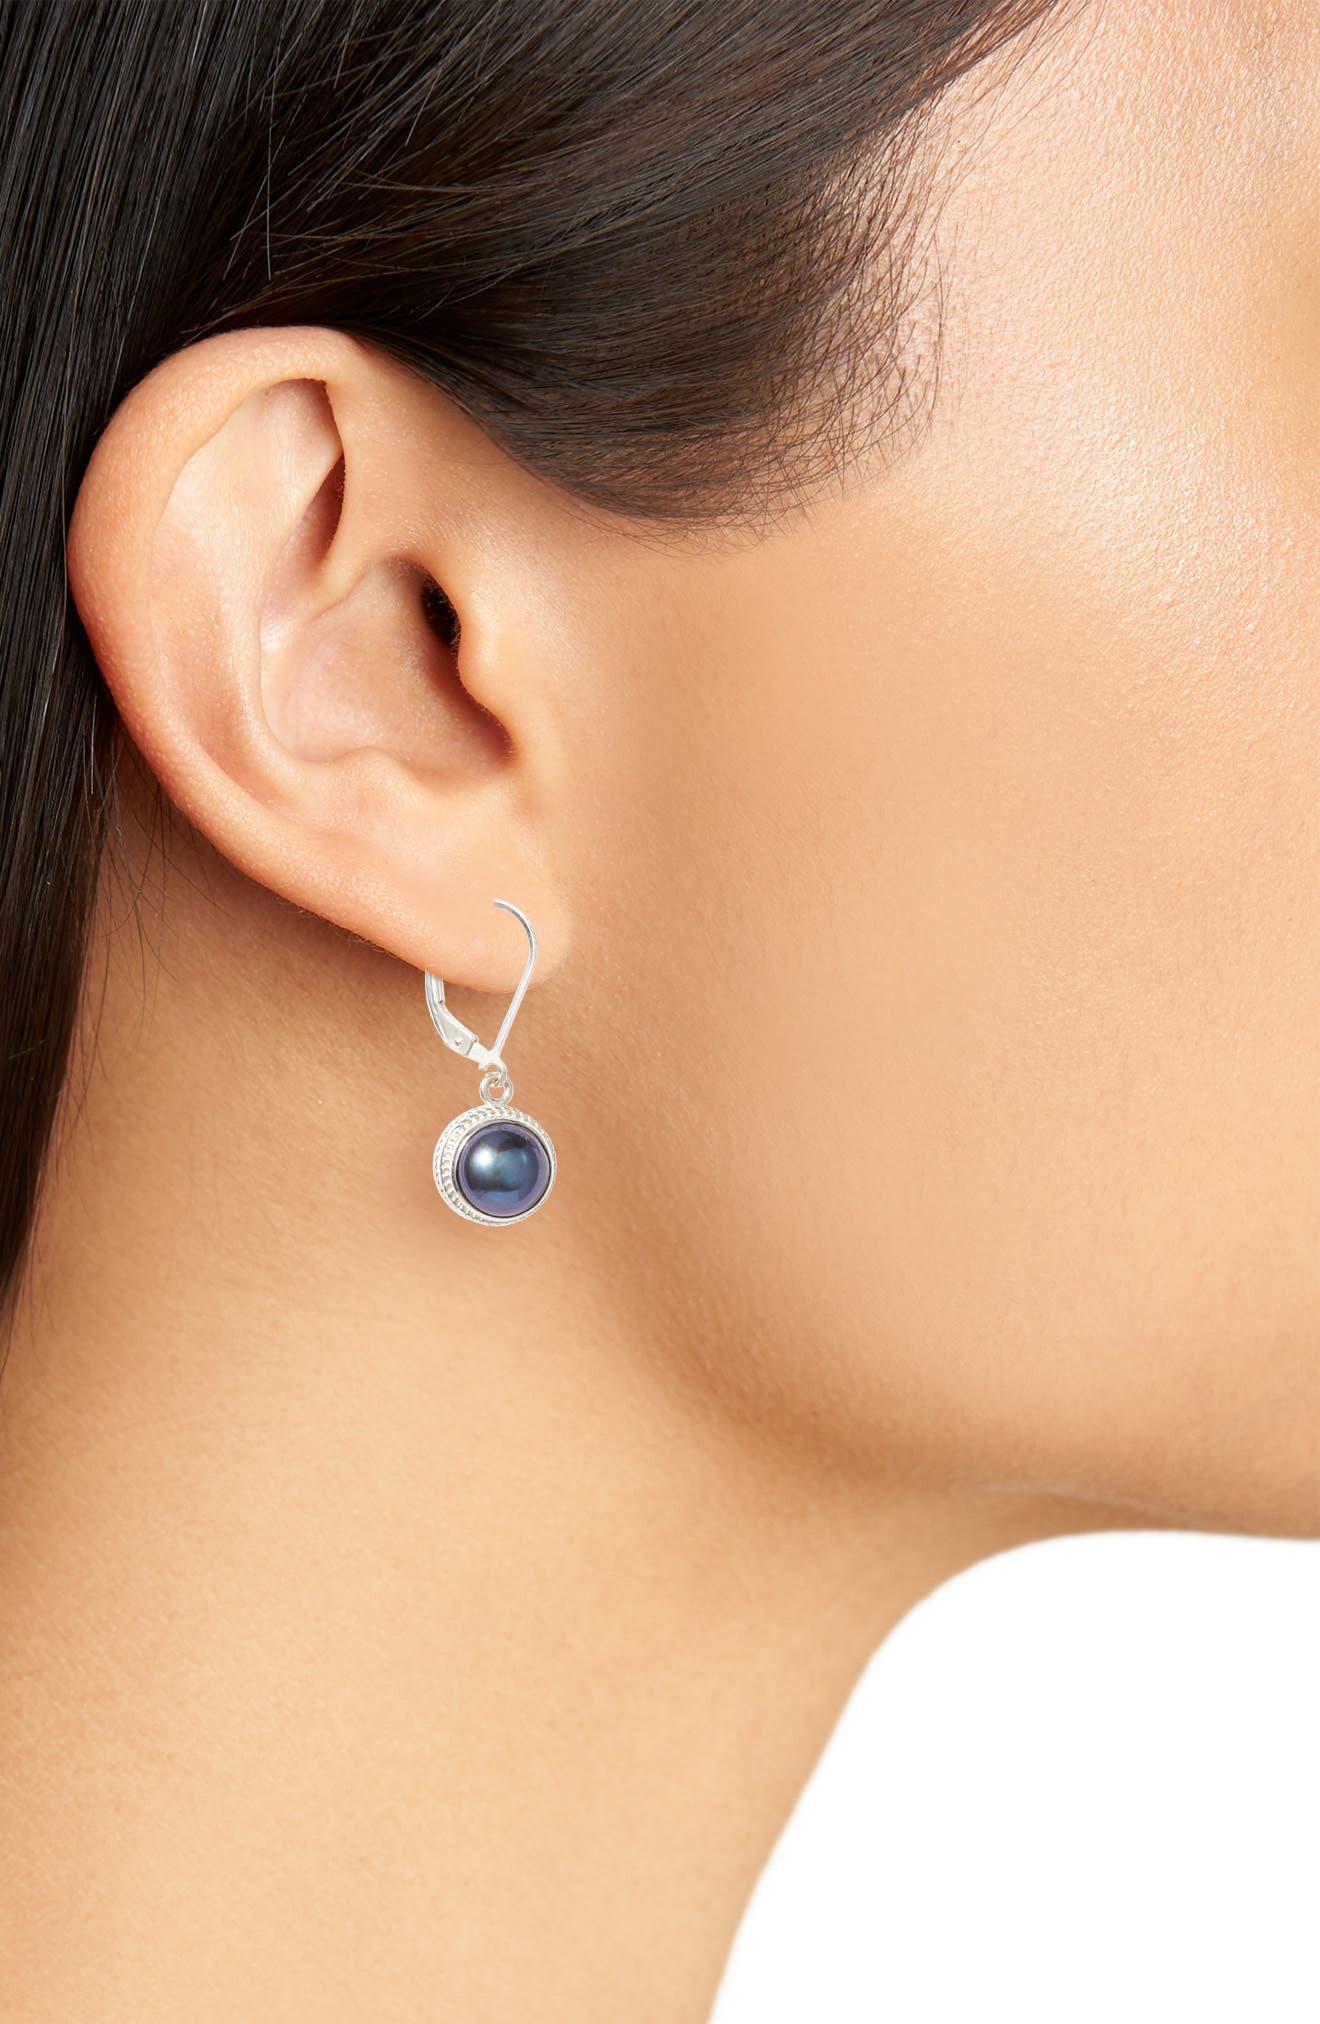 Genuine Blue Pearl Drop Earrings,                             Alternate thumbnail 4, color,